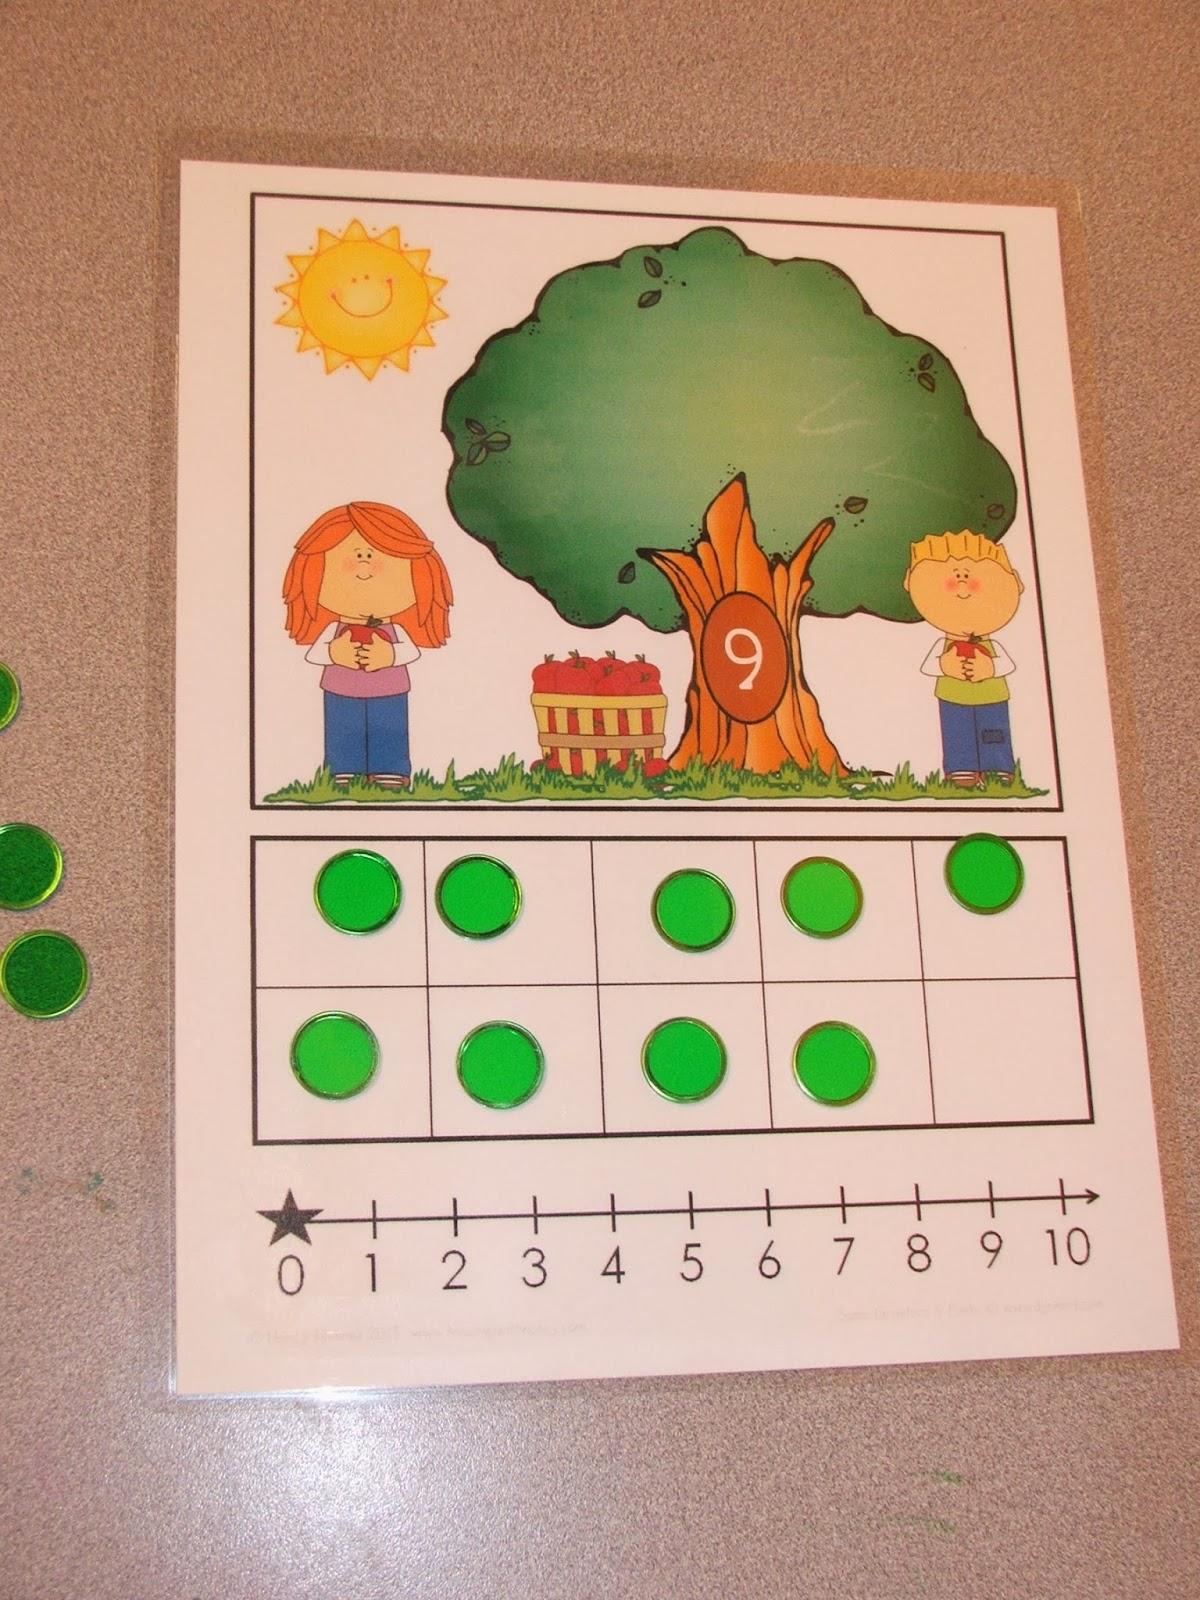 Highland Heritage Homeschool Kindergarten Apple Mania Part 3